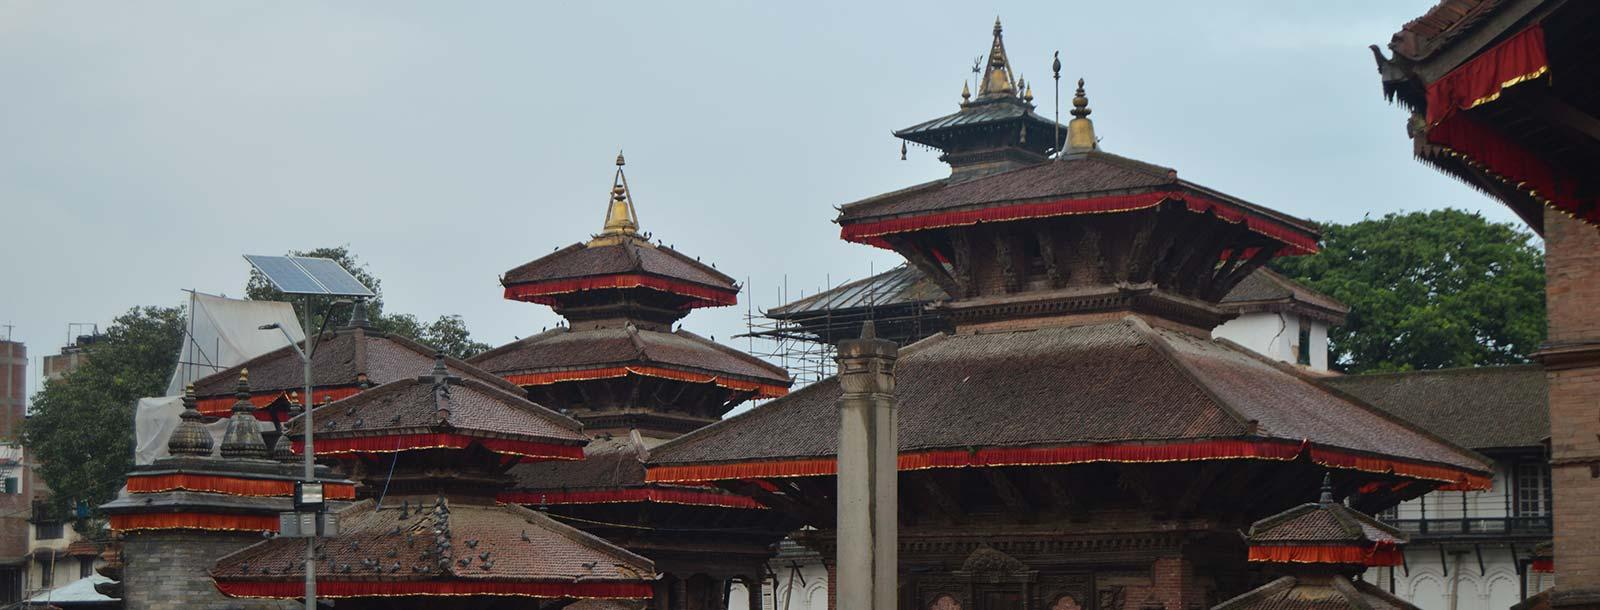 Kathmandu Exploring by Rickshaw-01 Day